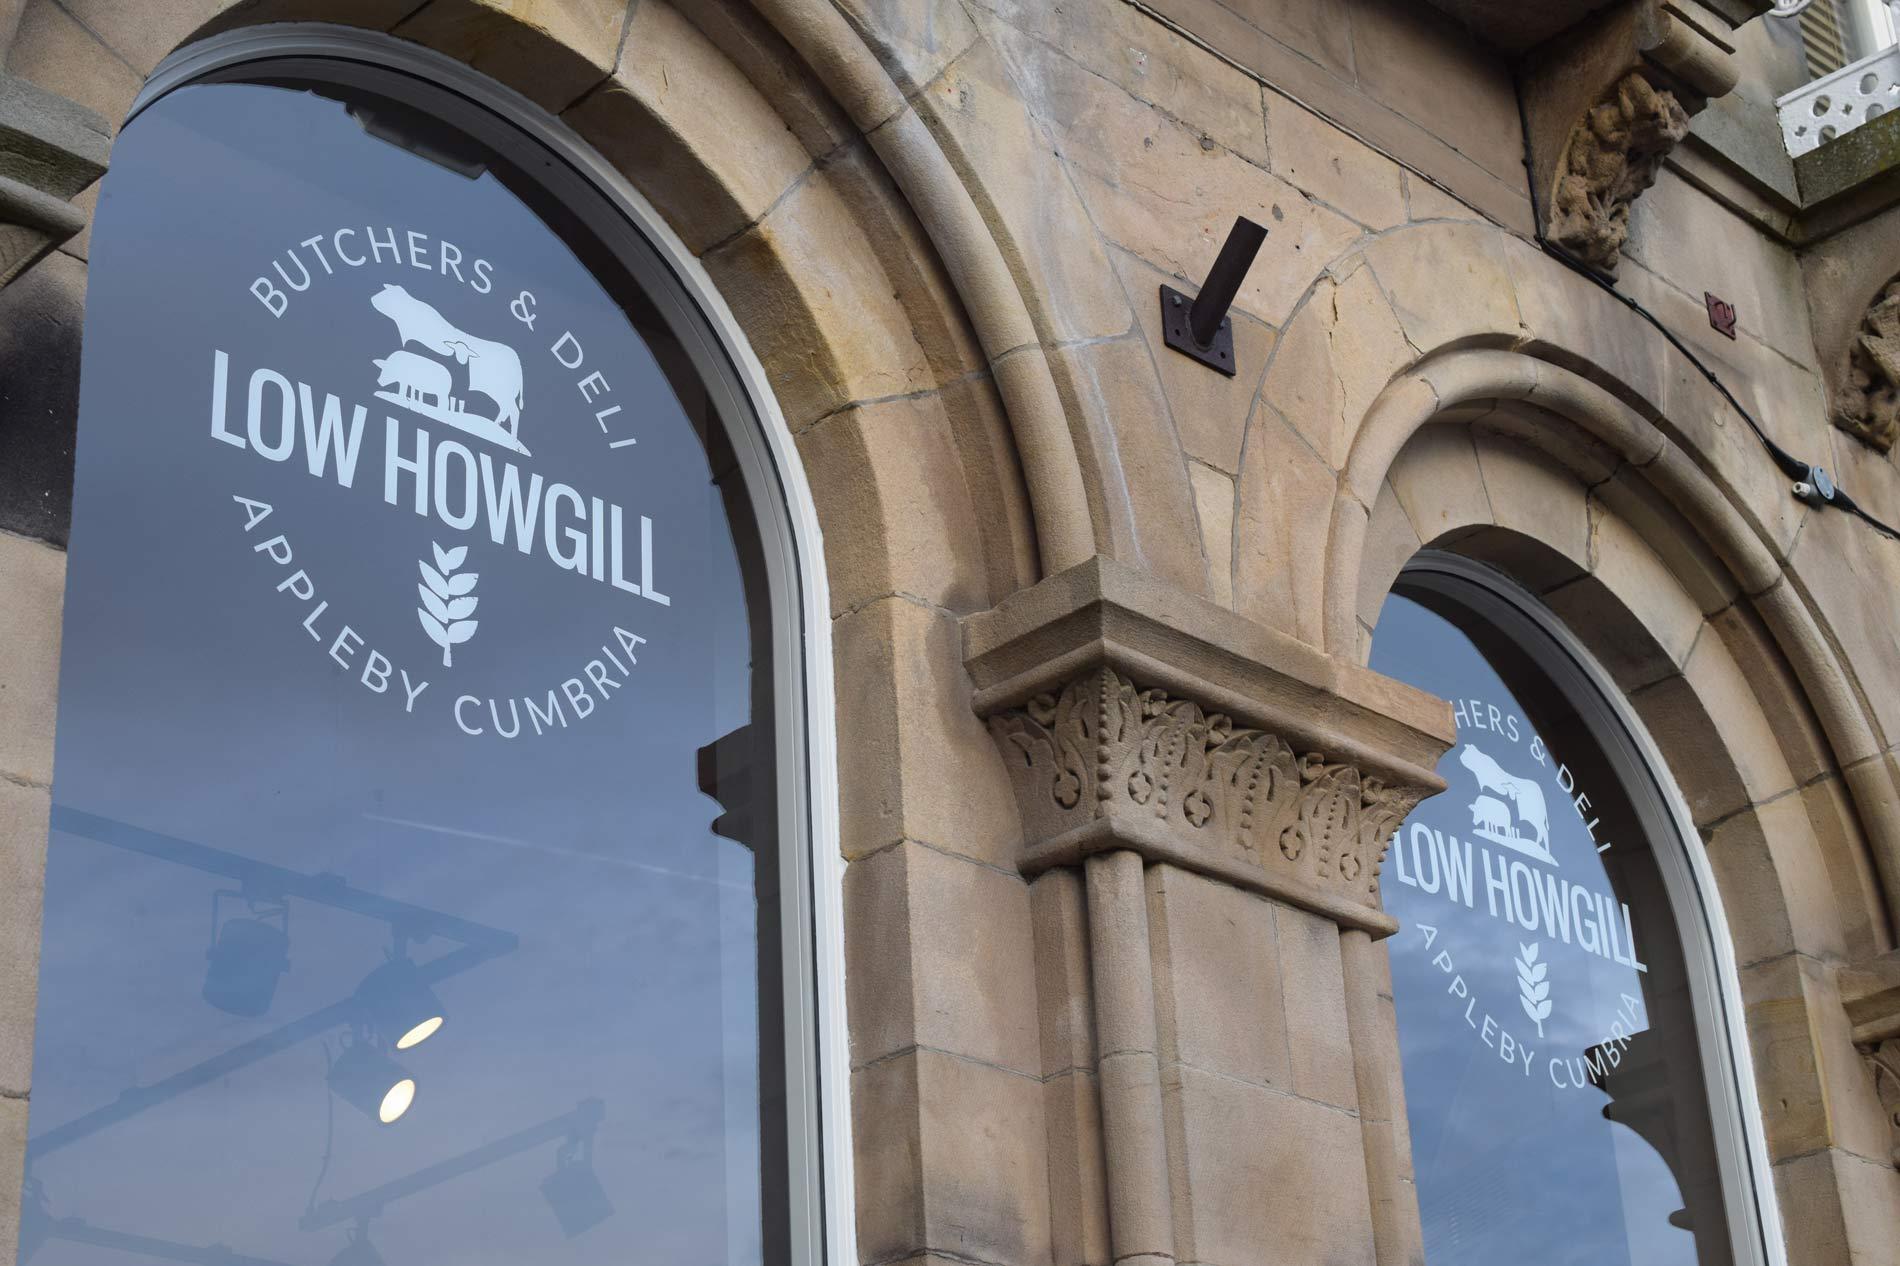 Low Howgill Butcher & Deli, Appleby, Cumbria logo branded windows